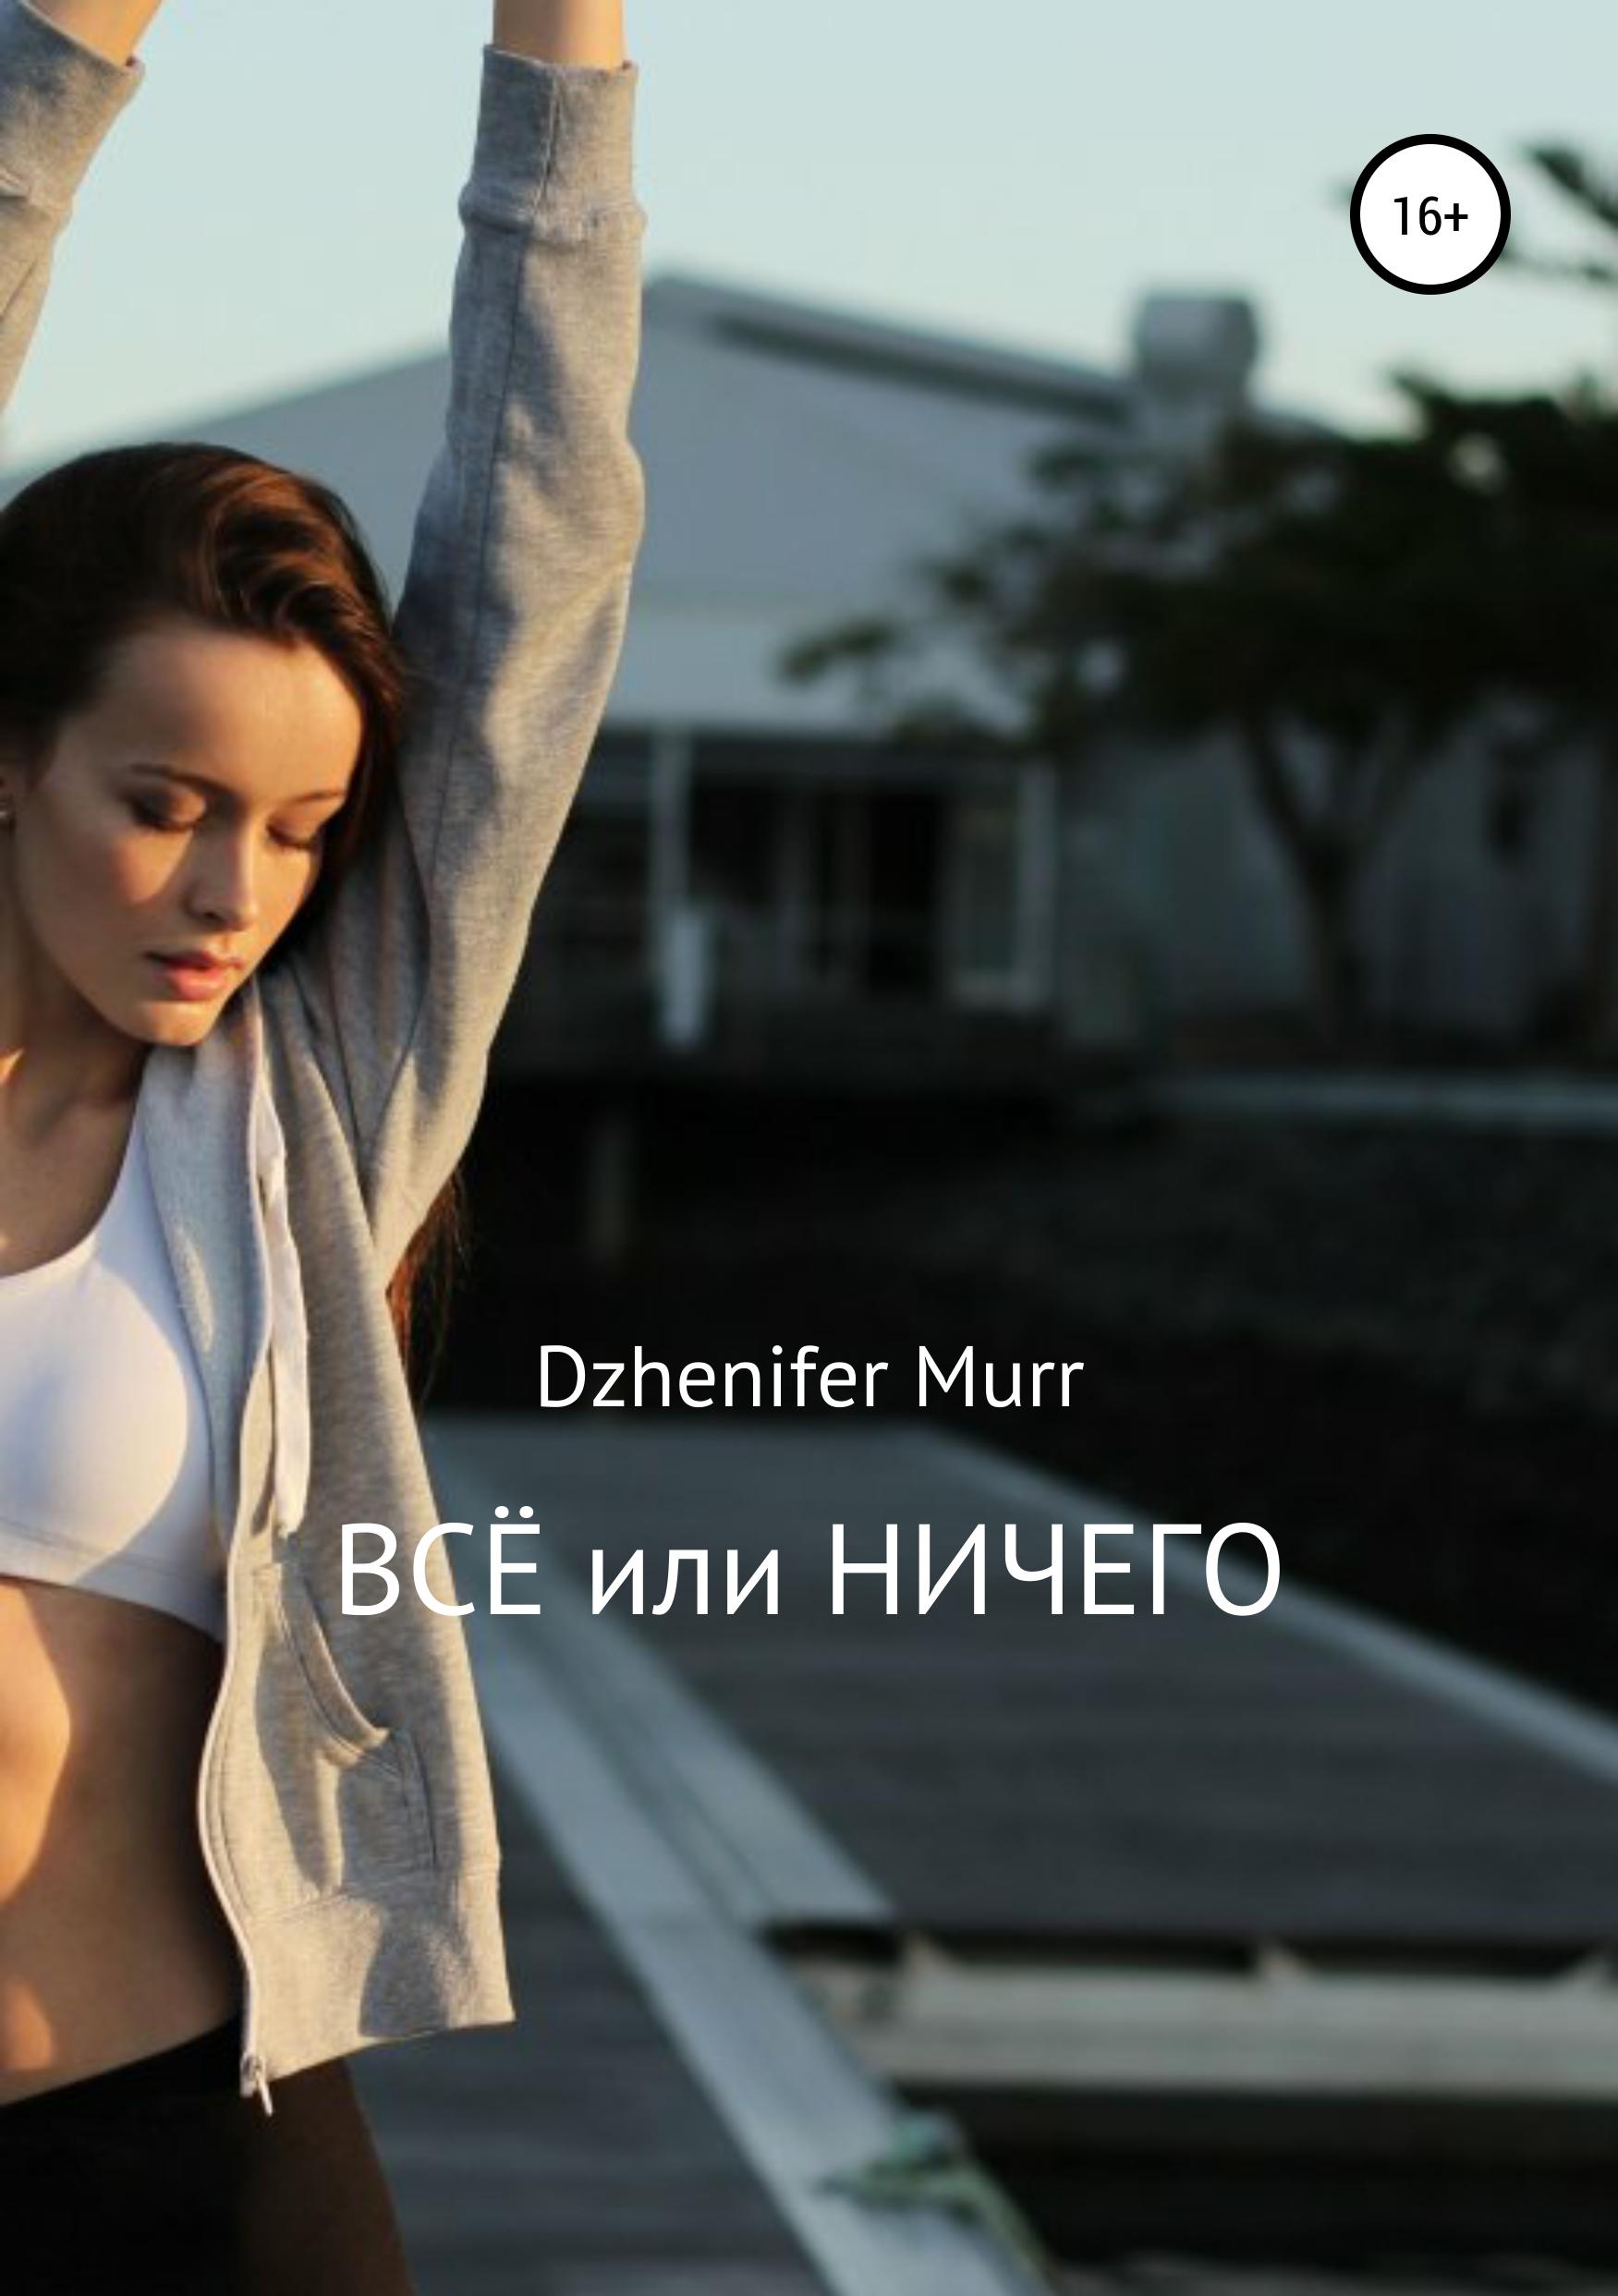 Dzhenifer Murr ВСЁ или НИЧЕГО